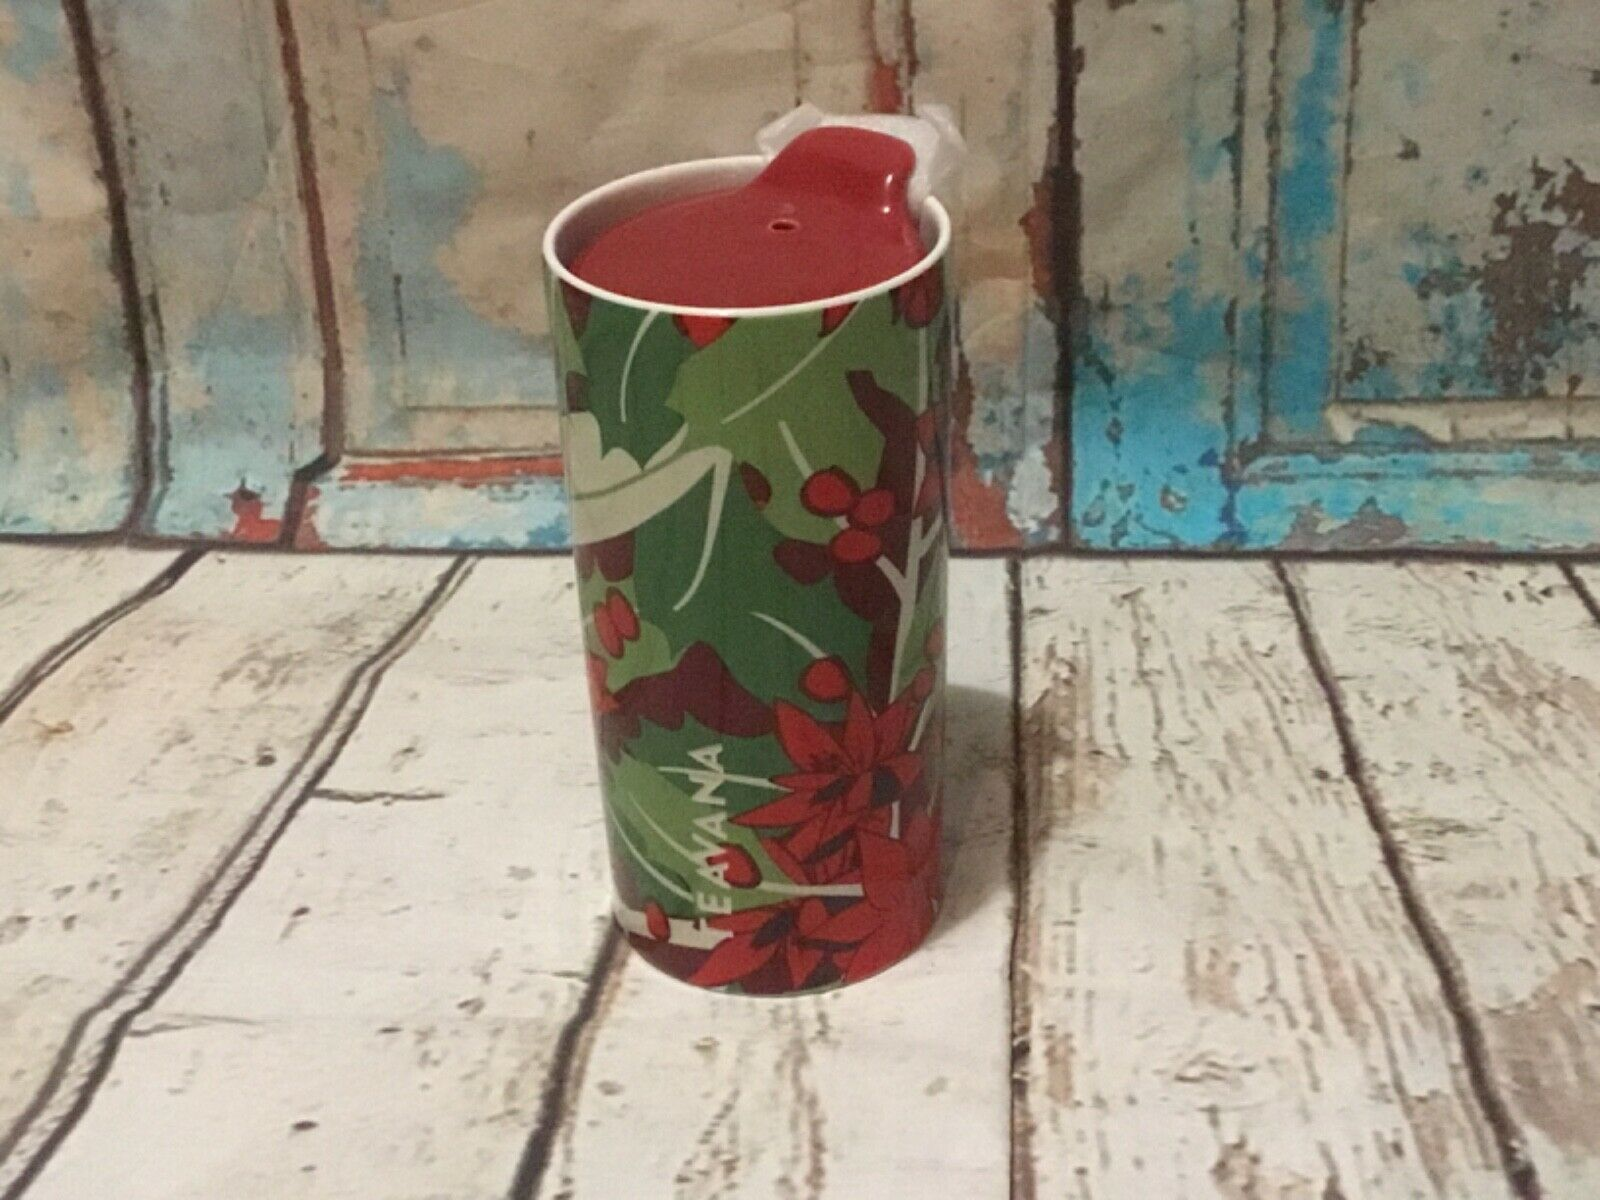 Teavana Poinsettia holiday ceramic tumbler travel lid 10 oz New - $21.46